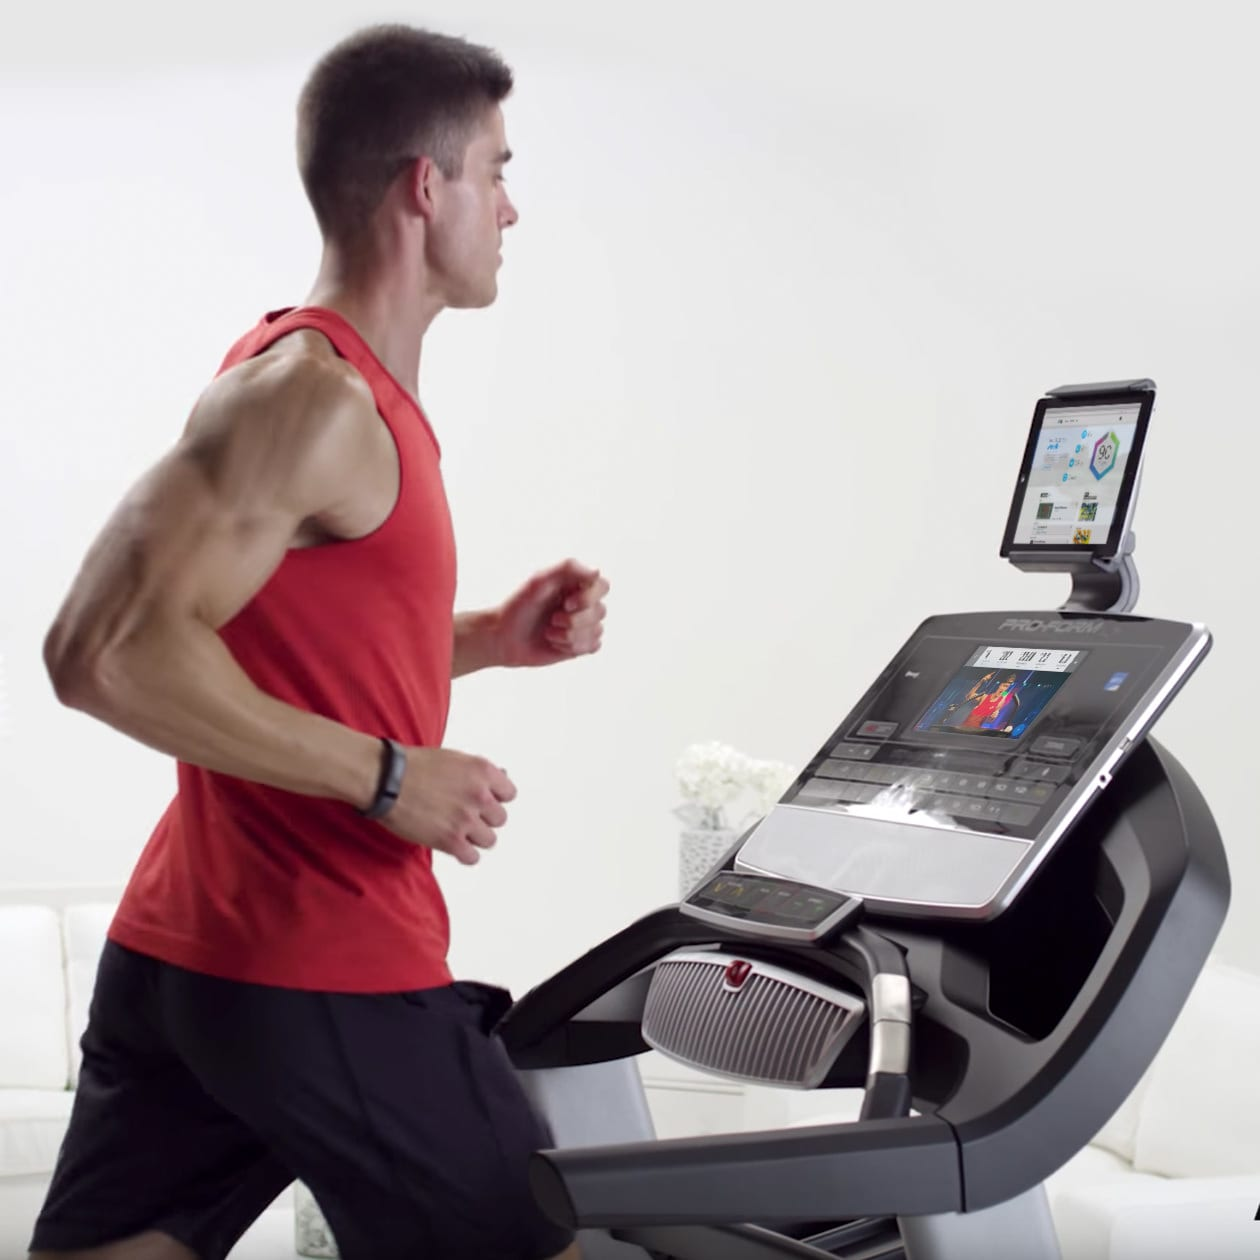 Workout Warehouse Treadmills ProForm Pro 9000  gallery image 6